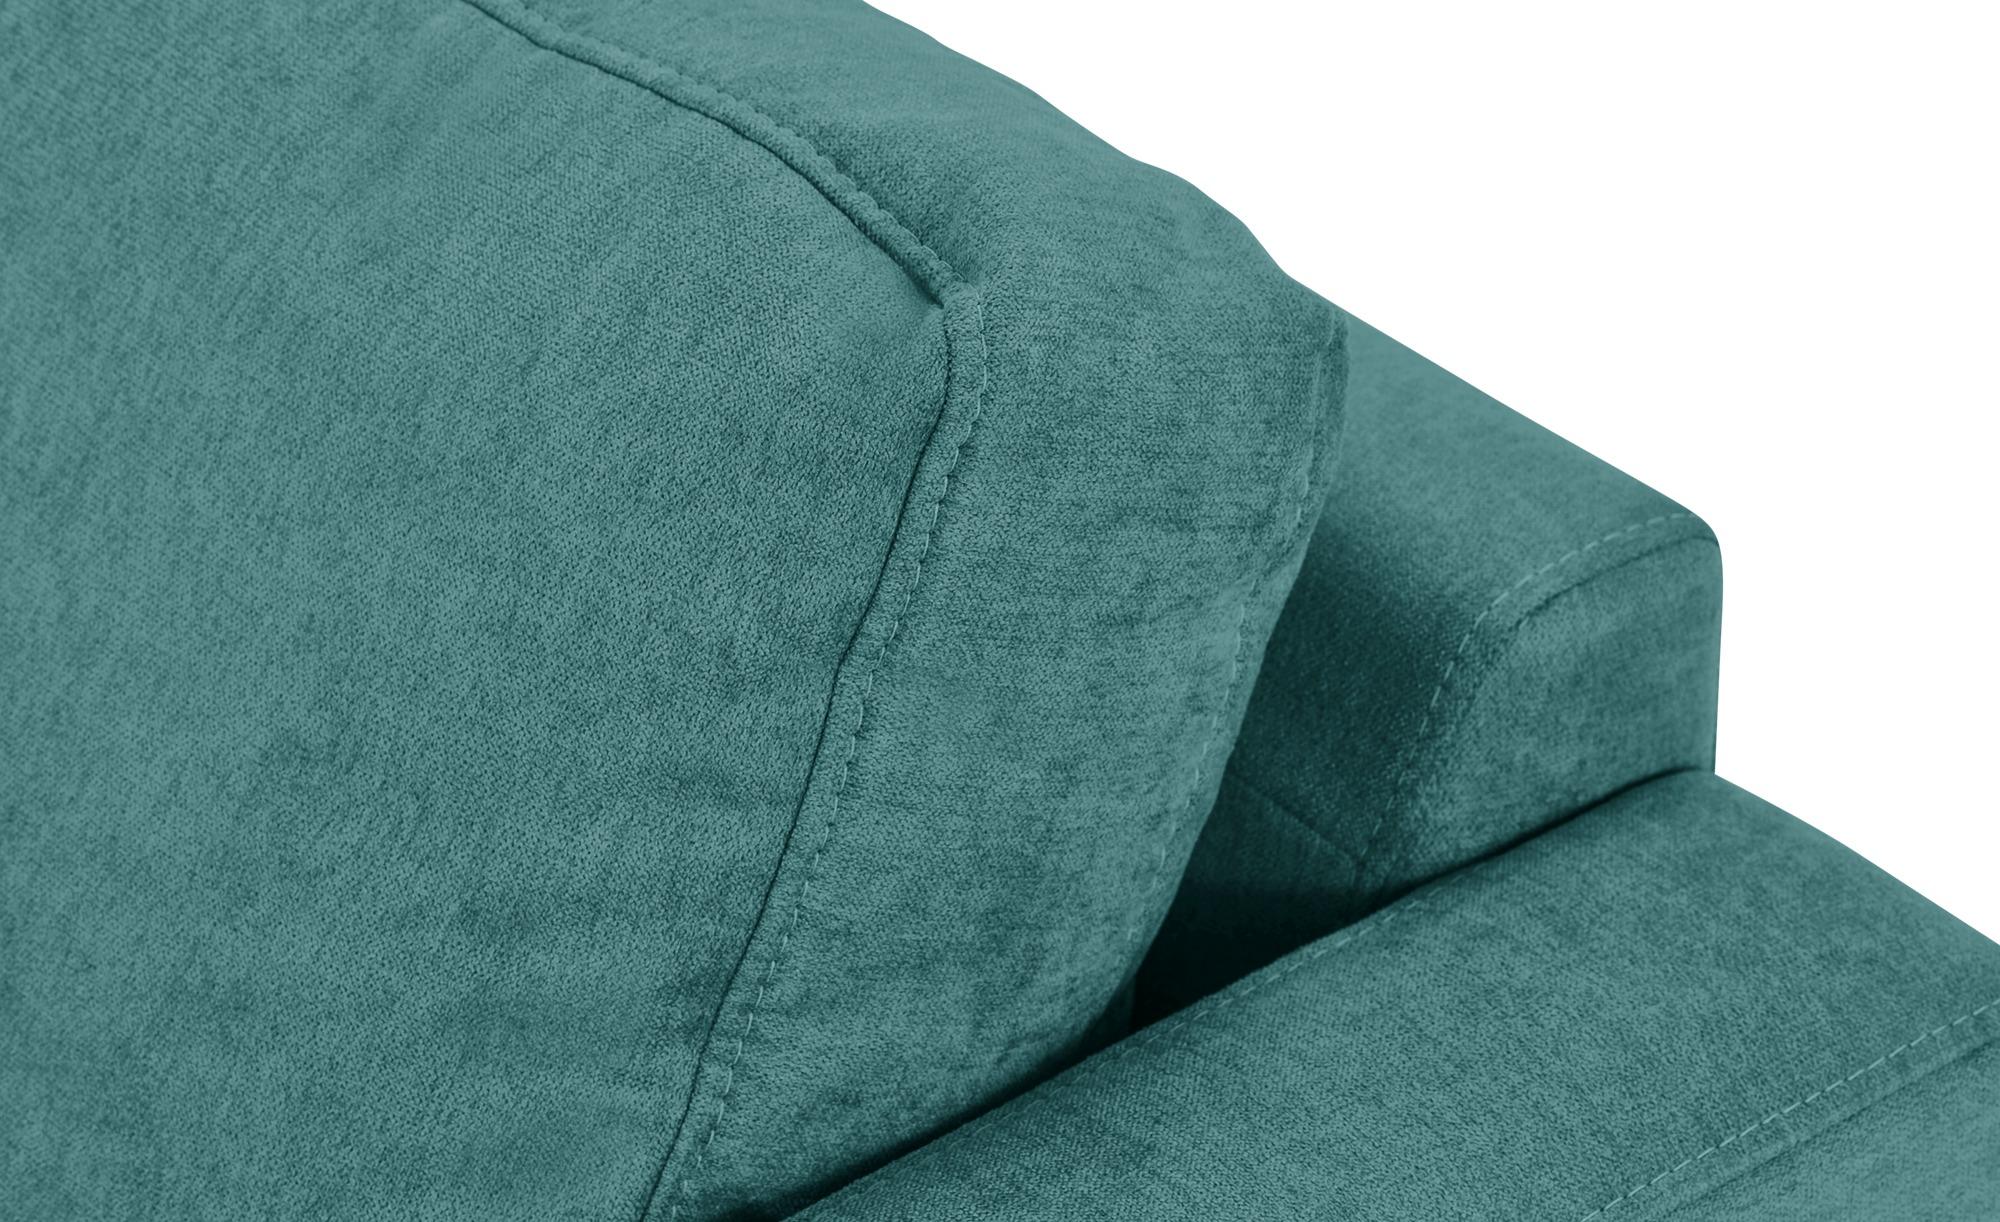 smart Sessel petrol - Stoff Geradine ¦ türkis/petrol ¦ Maße (cm): B: 91 H: 93 T: 92 Polstermöbel > Sessel > Polstersessel - Höffner